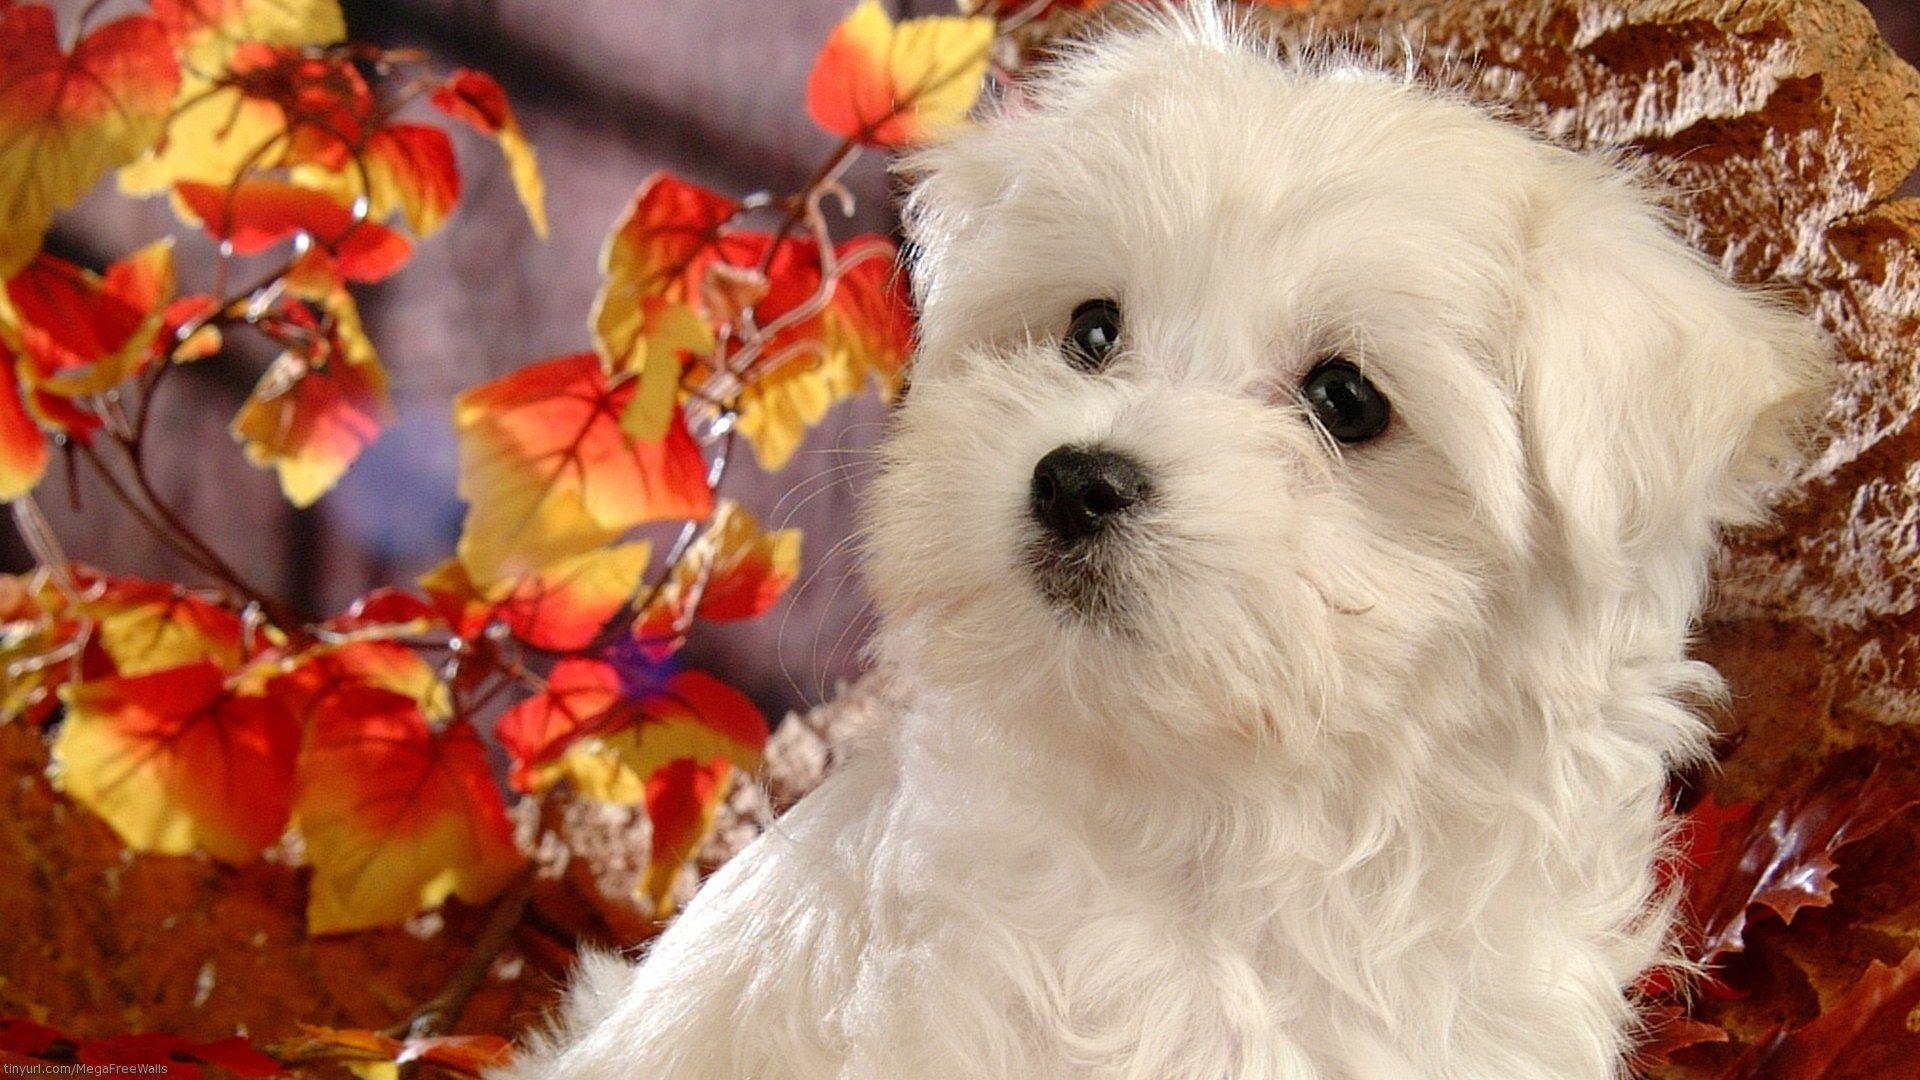 animaux chien chiot mignon animaux fond d 39 cran chiot pinterest animaux. Black Bedroom Furniture Sets. Home Design Ideas